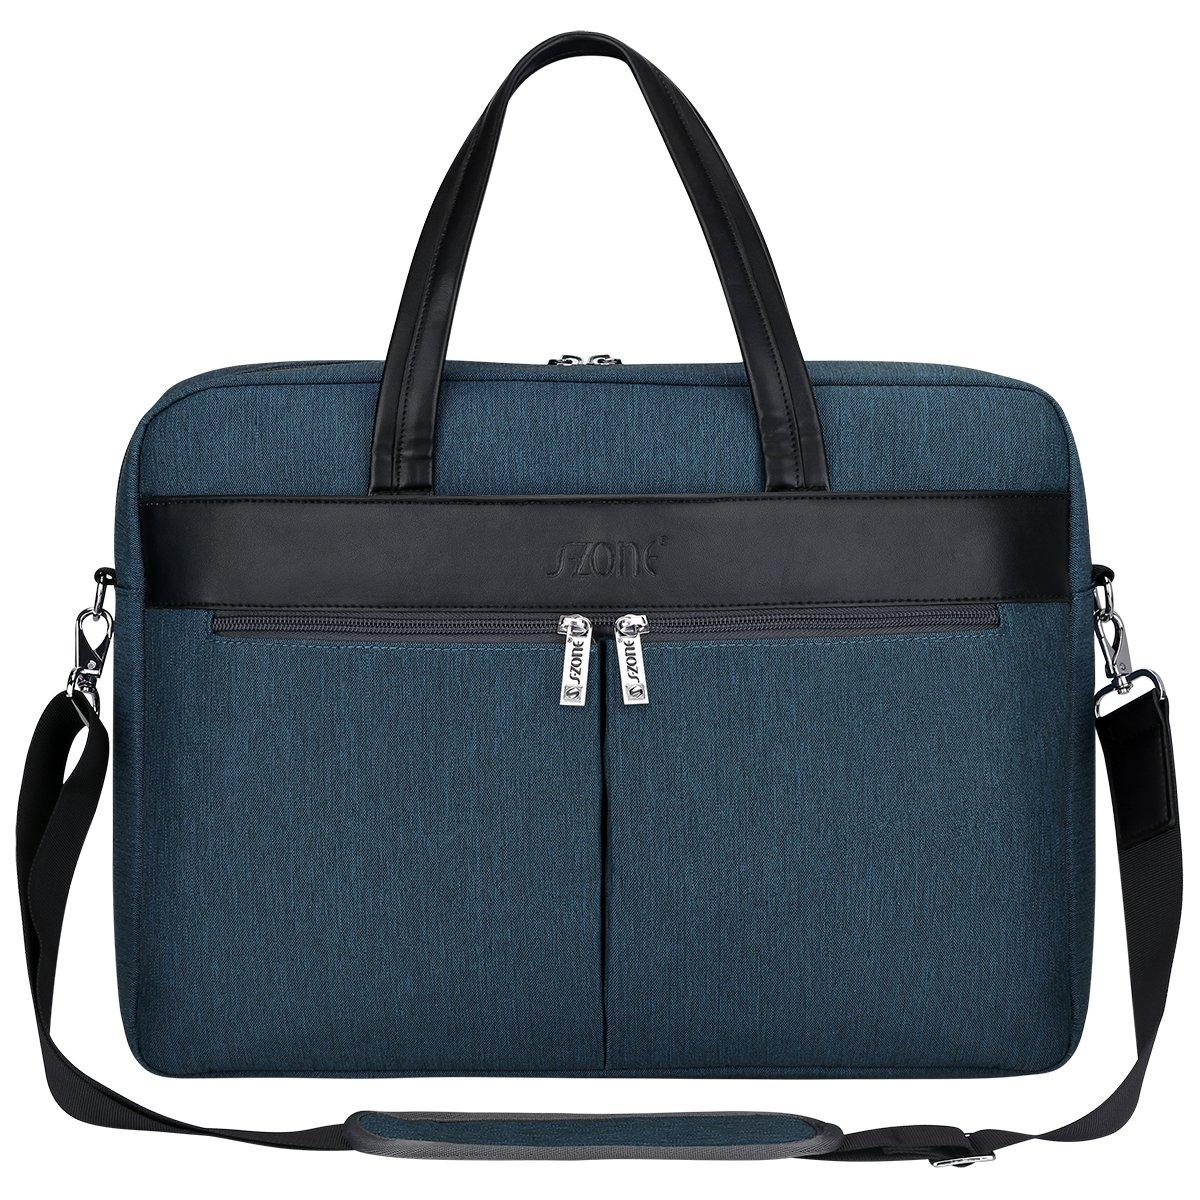 1122e79c4c Amazon.com  S-ZONE Laptop Tote Bag for Women 15.6 inch Large Business Work  Bag Shoulder Briefcase Handbag  Clothing